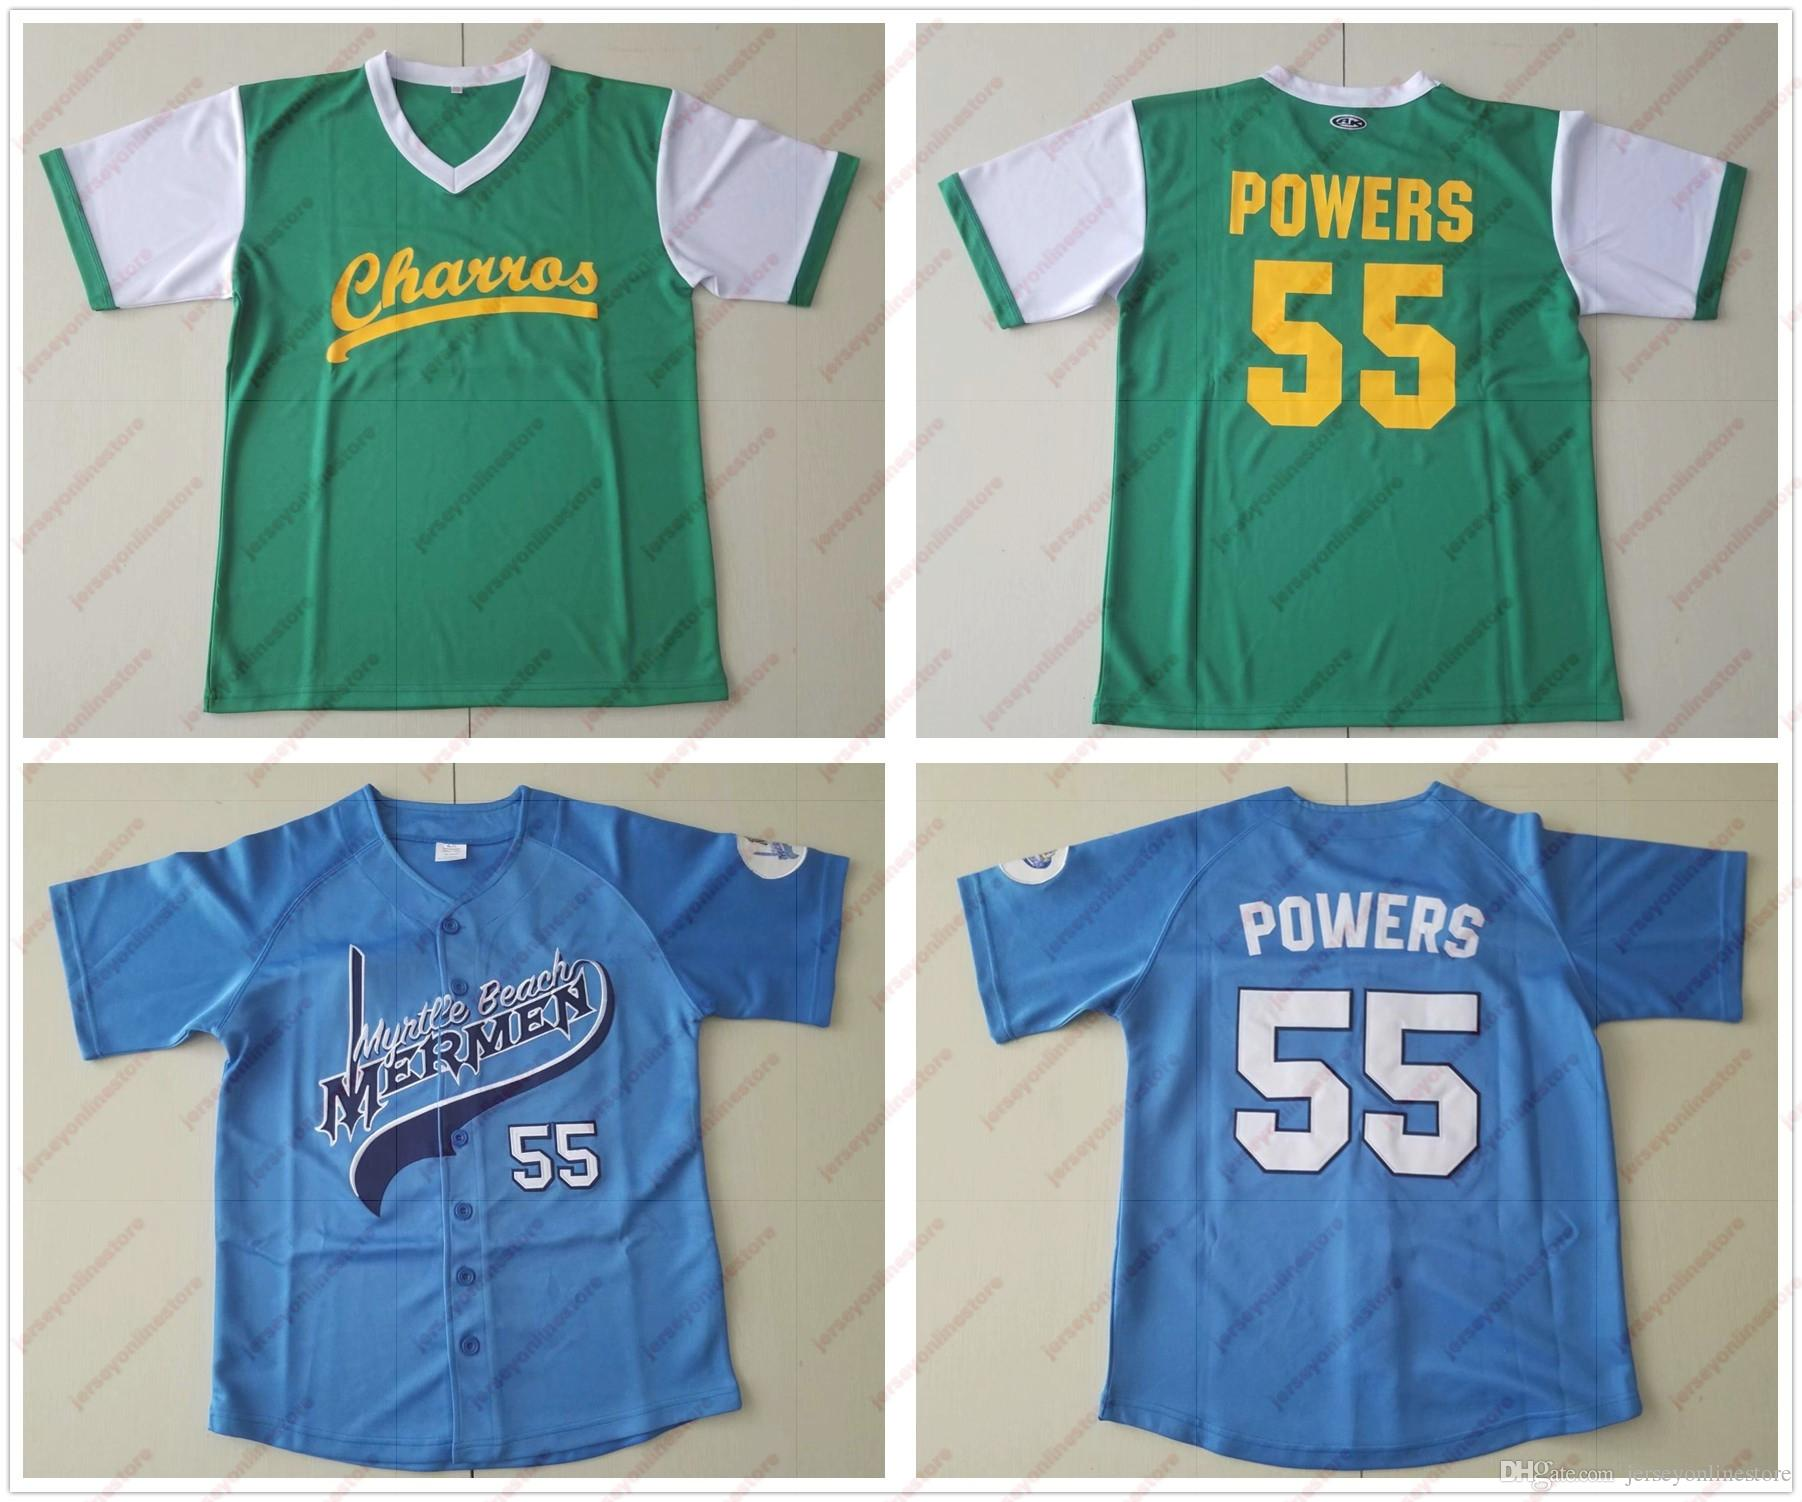 2019 Mens Mexican Charros Movie  55 Kenny Powers Jersey Blue Green Powers  Myrtle Beach Mermen Baseball Jerseys From Jerseyonlinestore 3a3b074a1c49